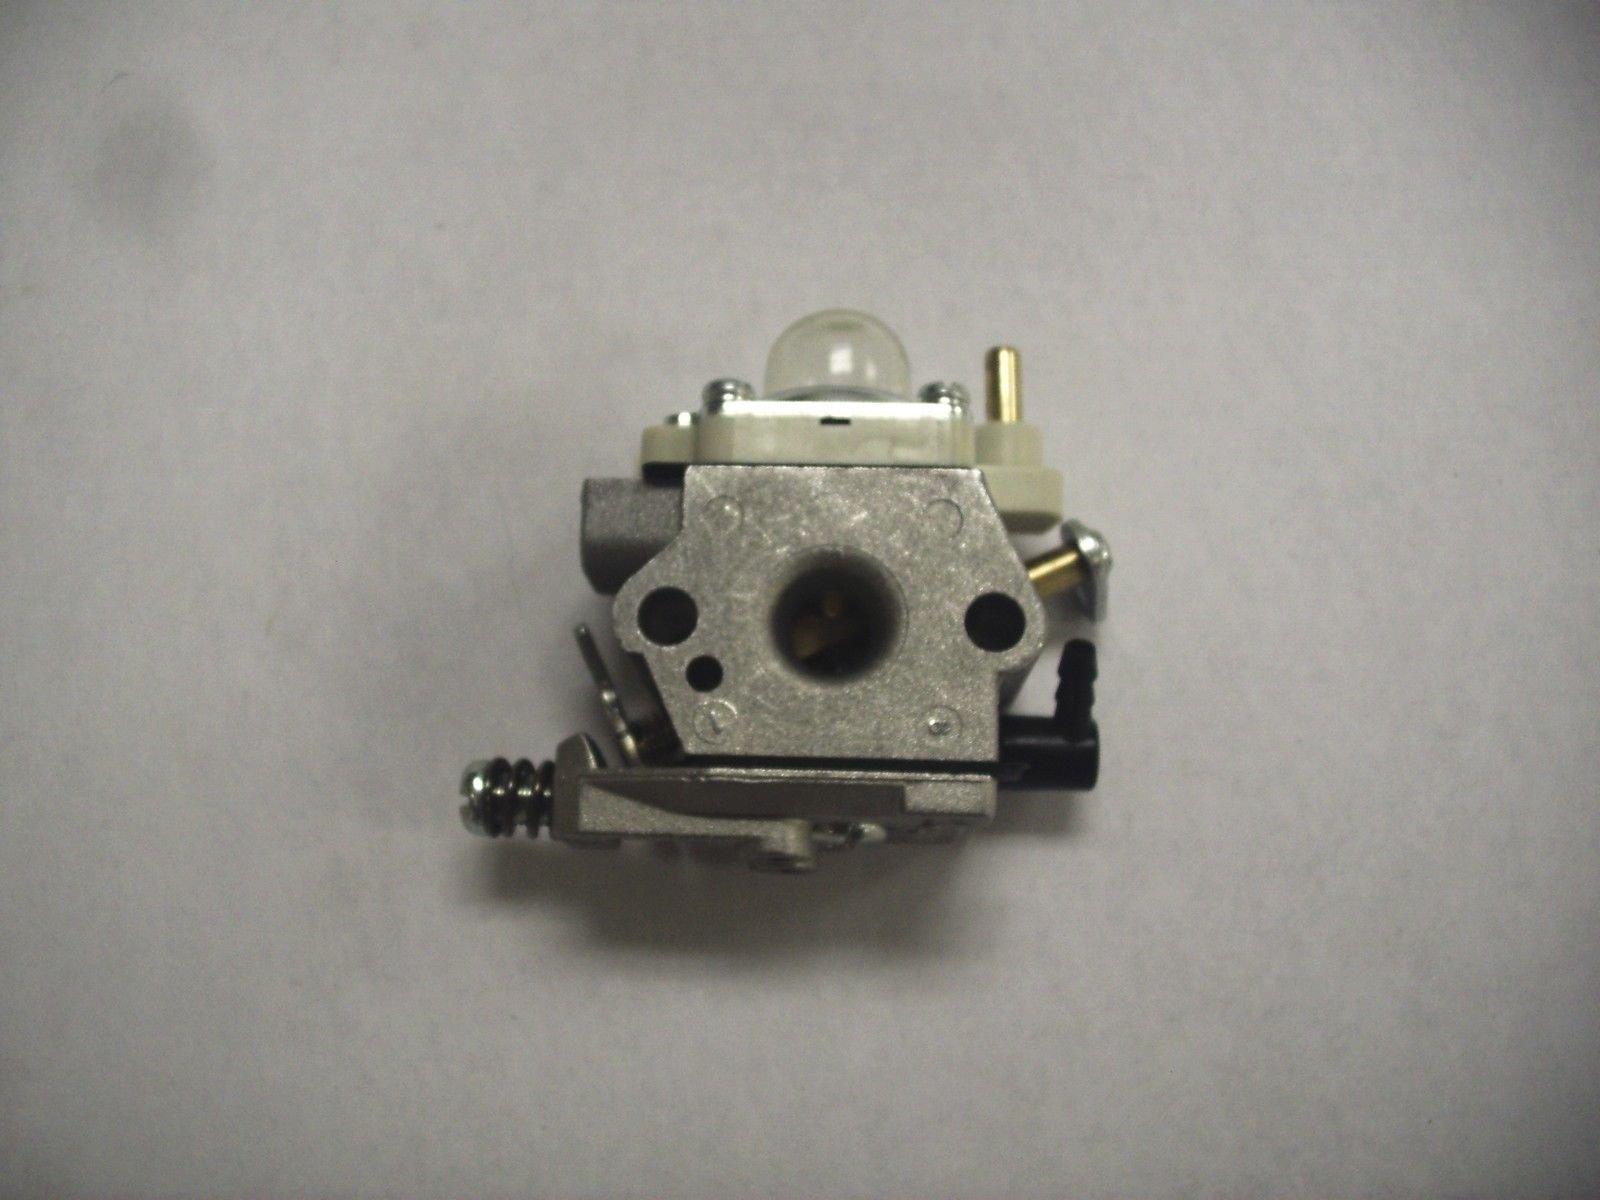 Genuine OEM Echo A021001882/A021001881 Carburetor WTA-33 for PB-250 Power Blower